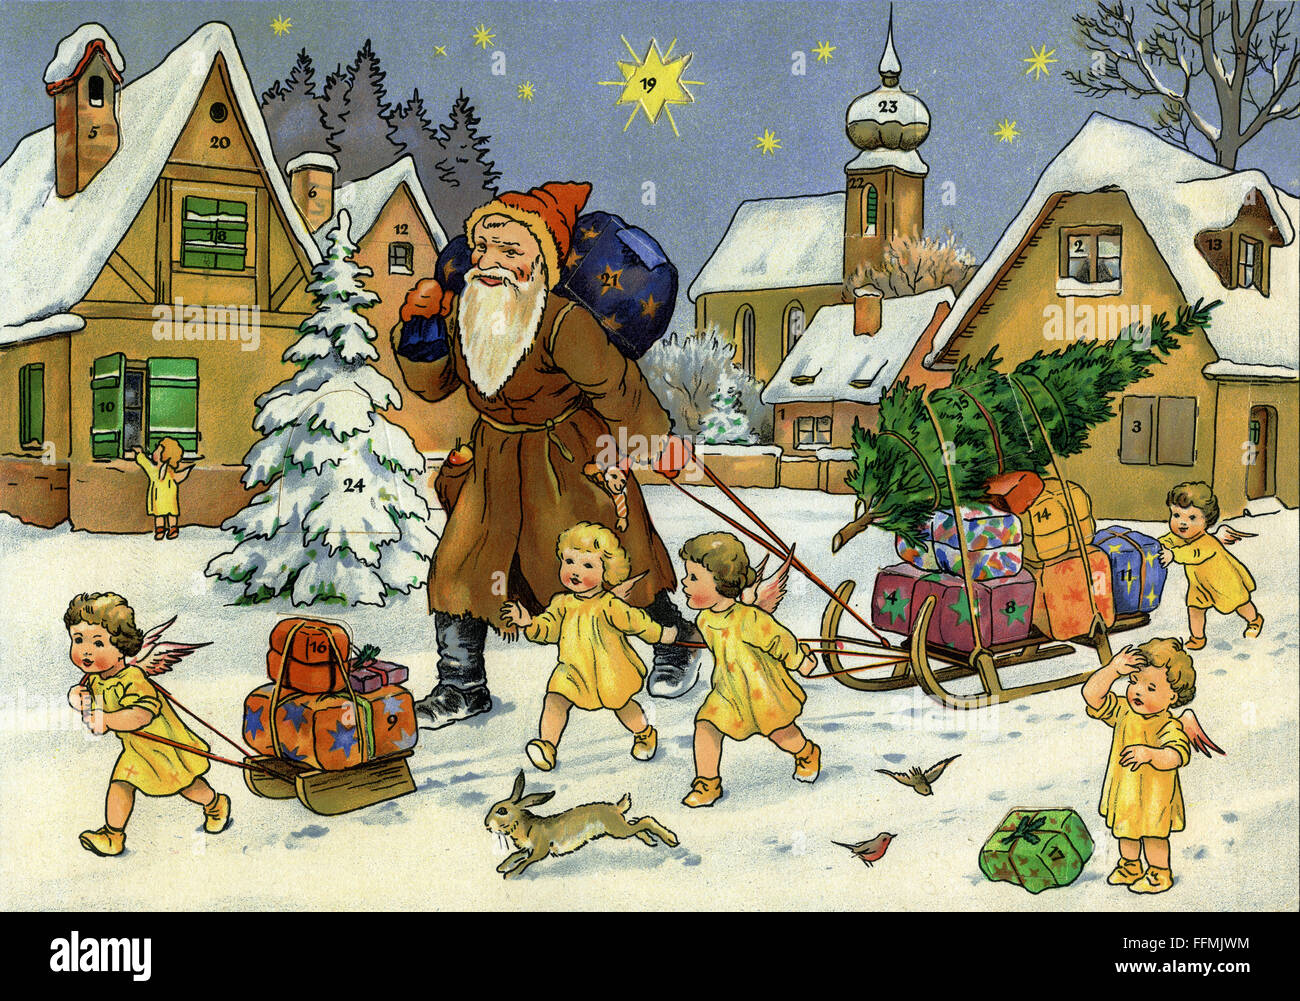 San Nicola Calendario.Natale Calendario Dell Avvento Babbo Natale San Nicola